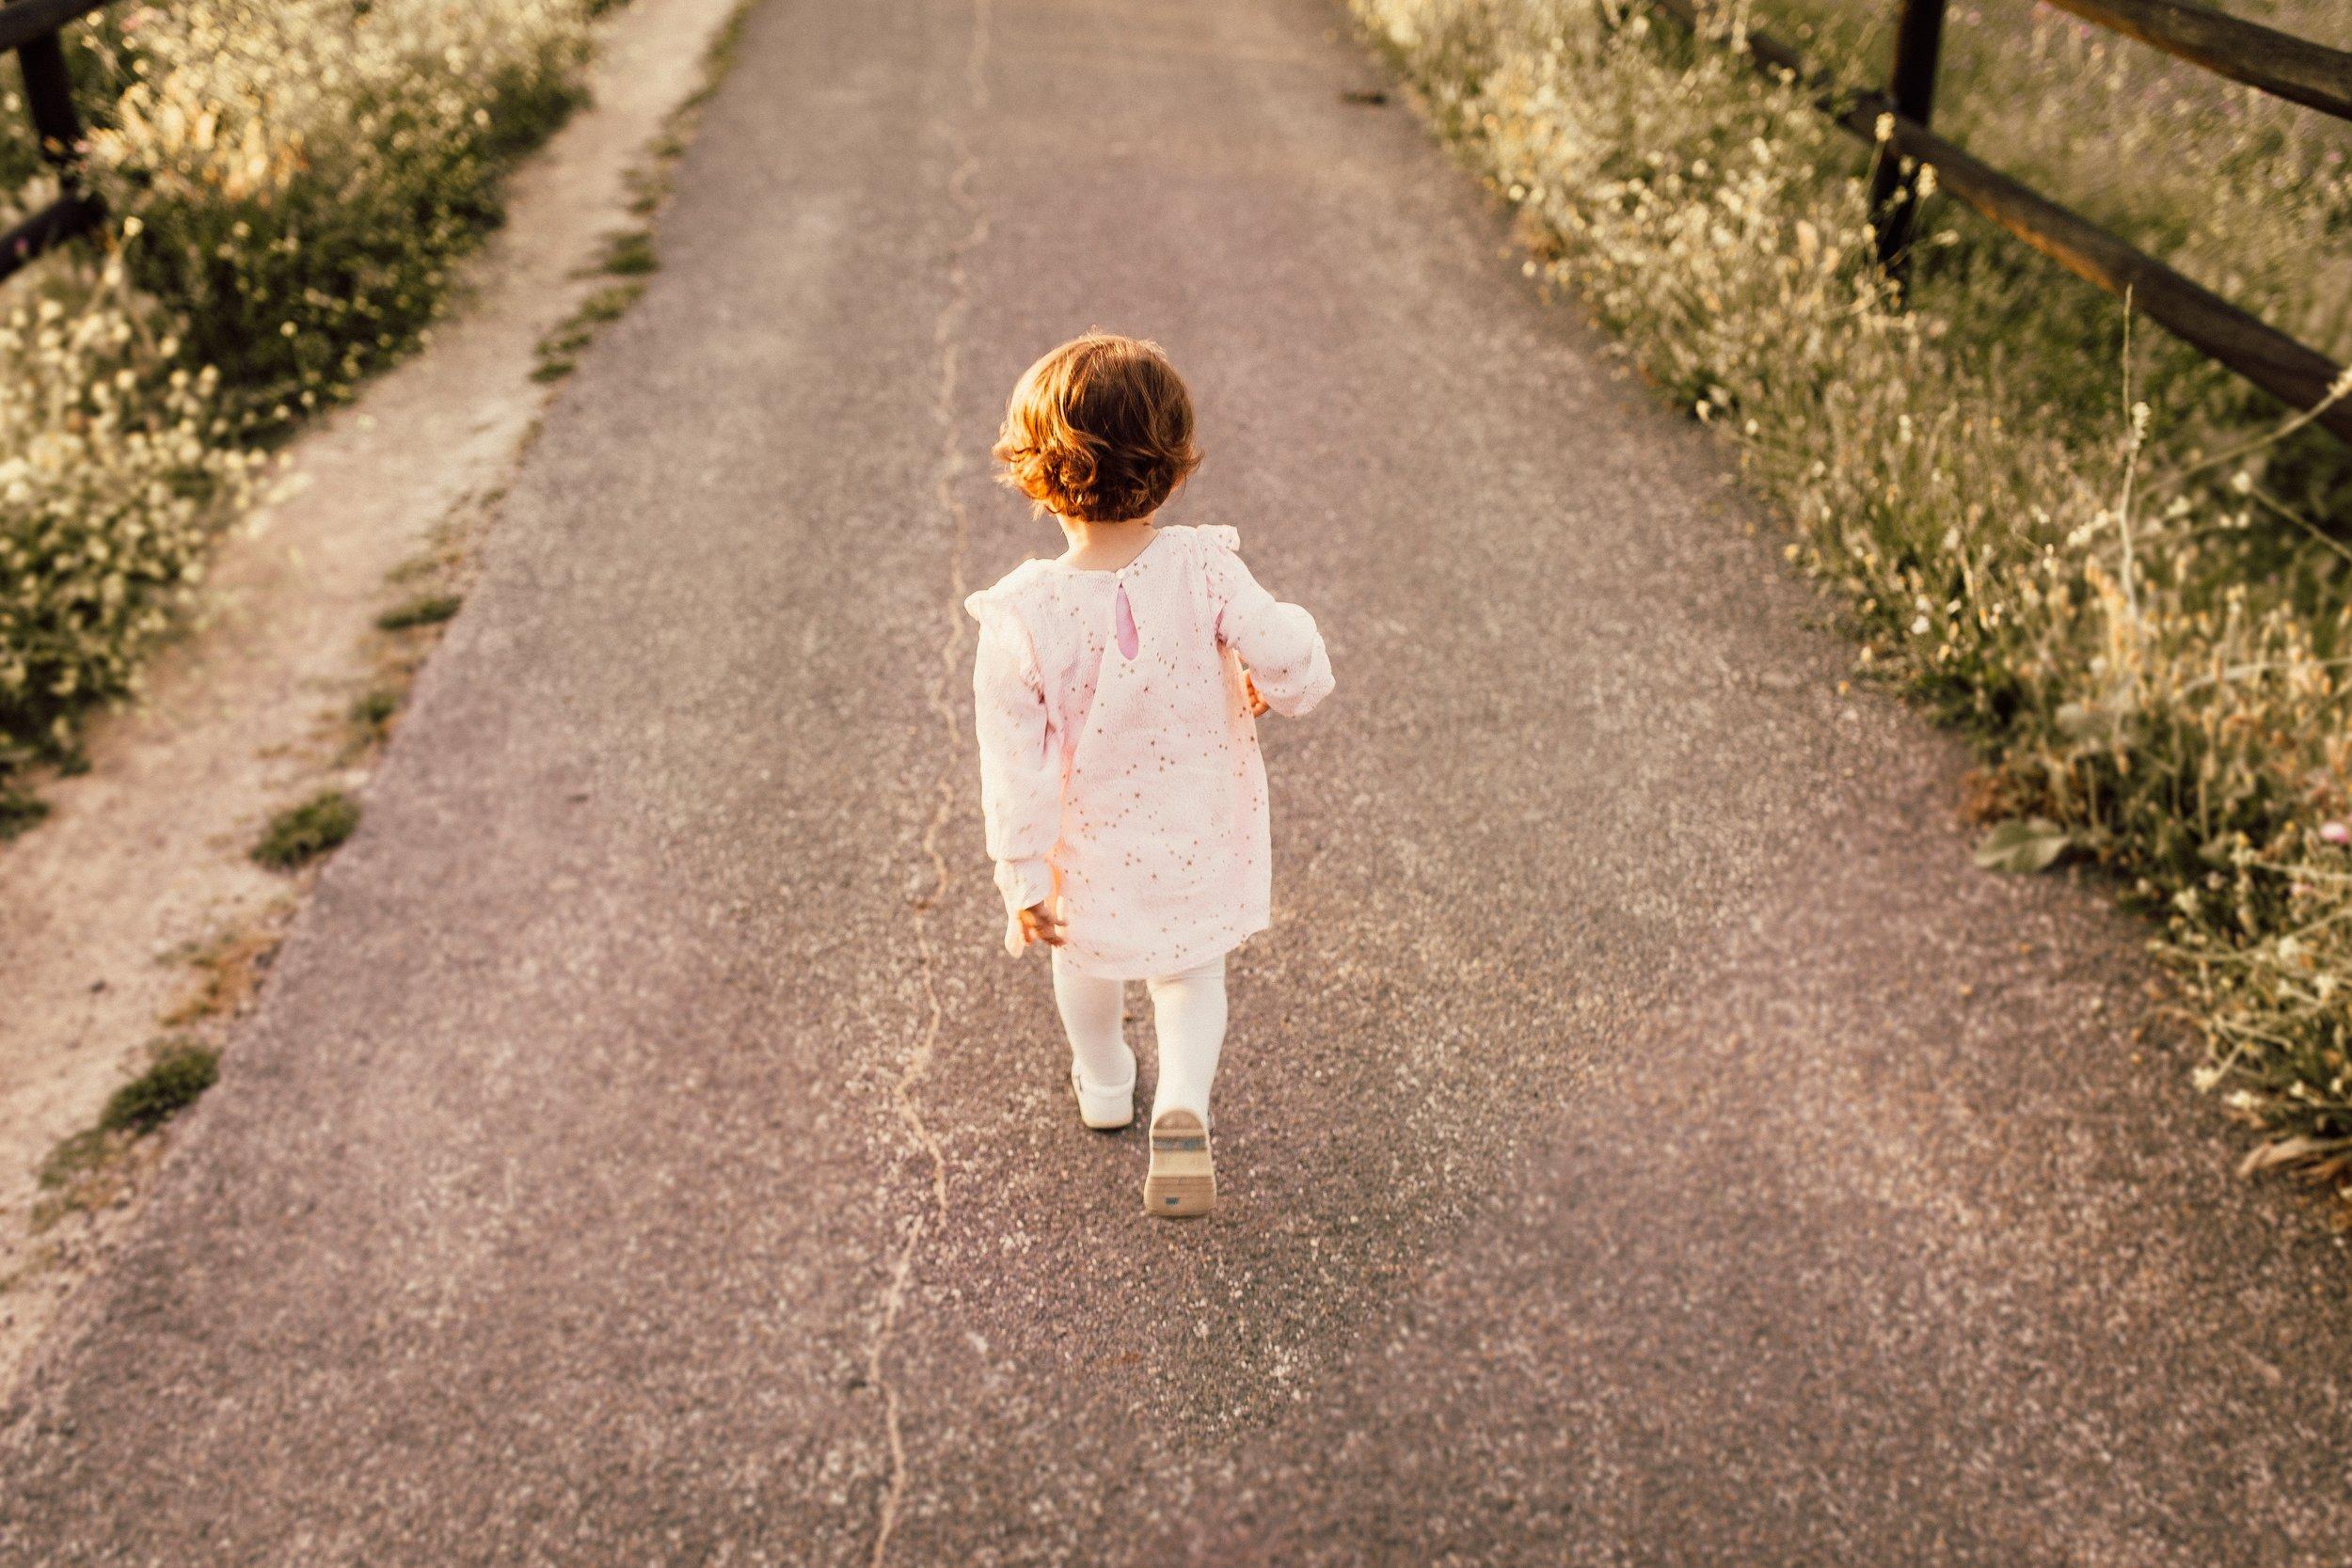 alone-asphalt-baby-1120106.jpg